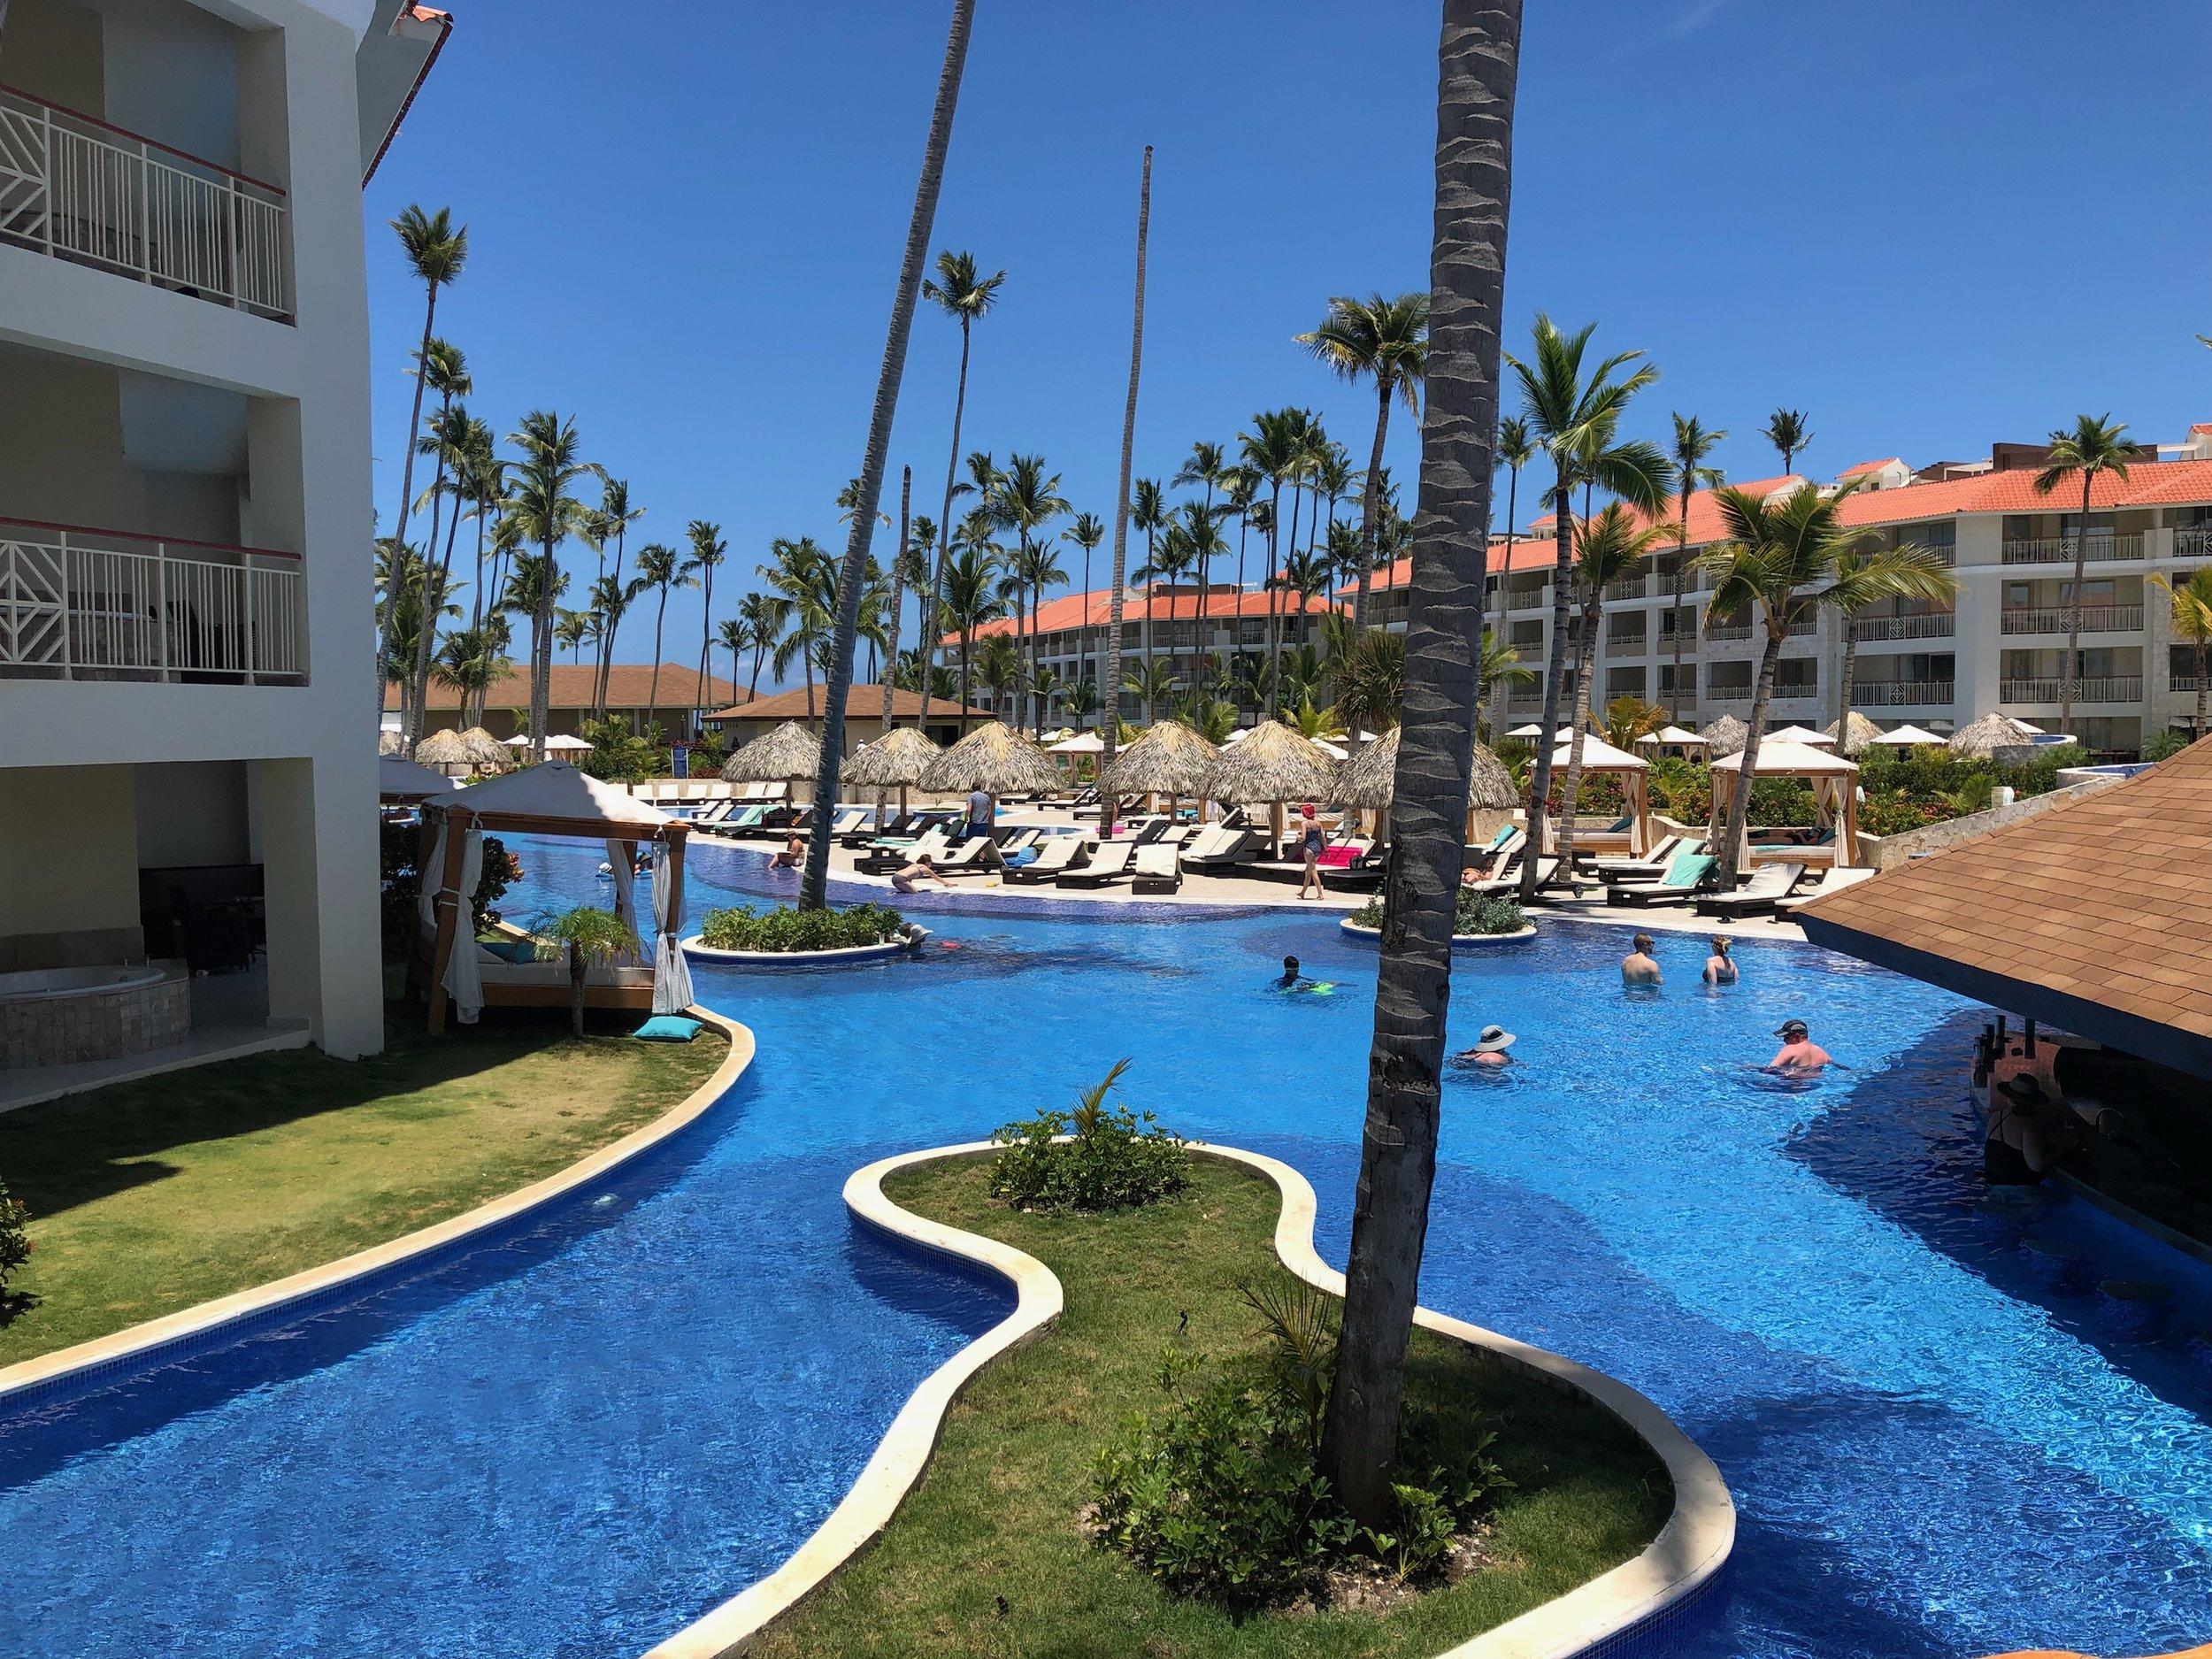 Wonderful winding pool alongside the rooms.